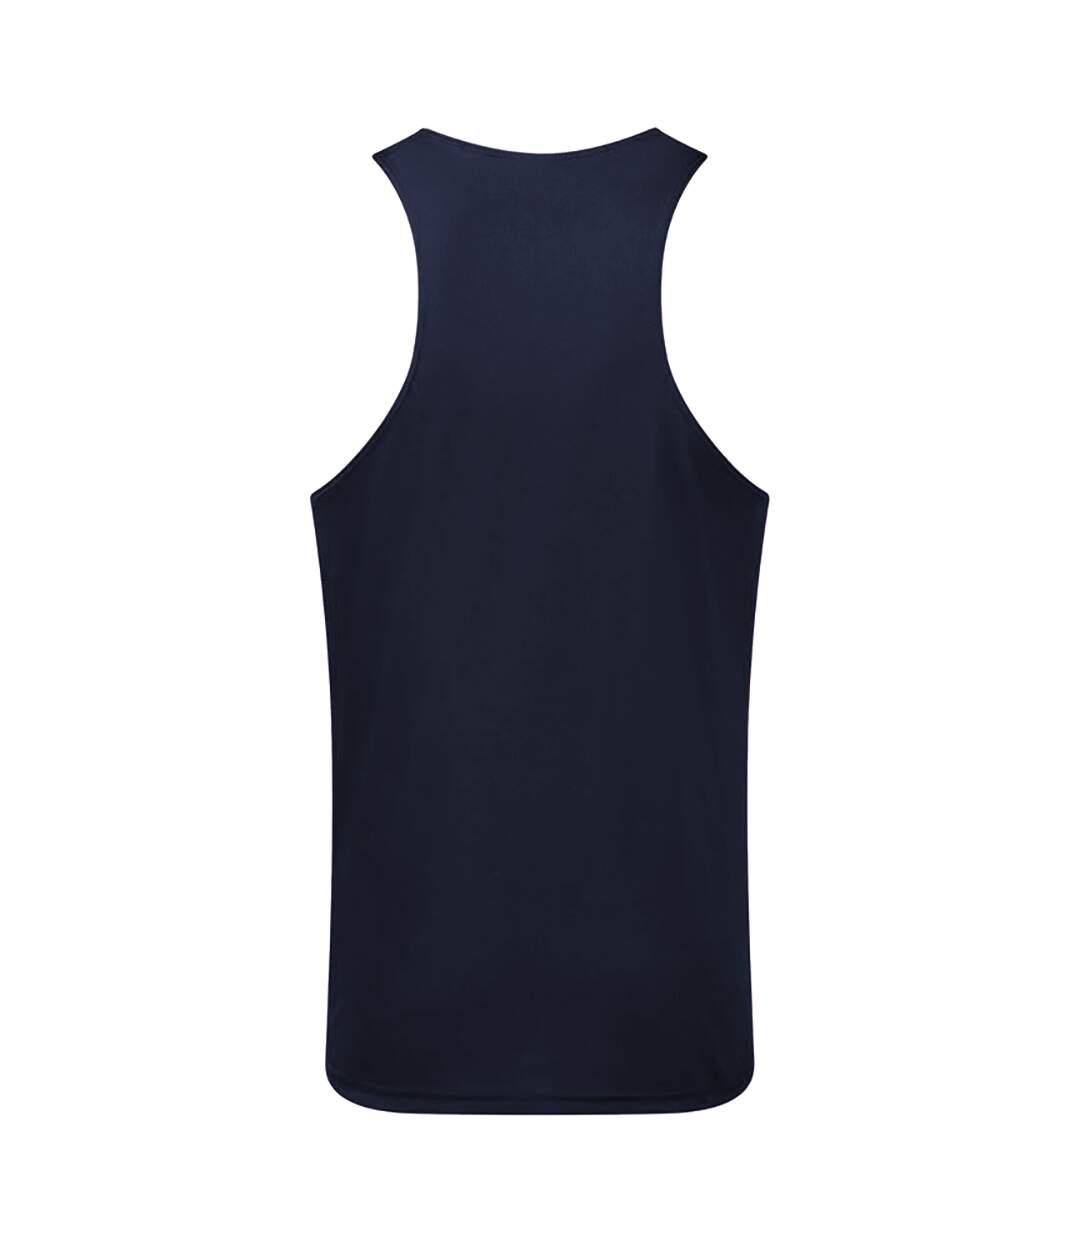 Gildan Mens Performance Racerback Vest (Sport Dark Navy) - UTRW6074